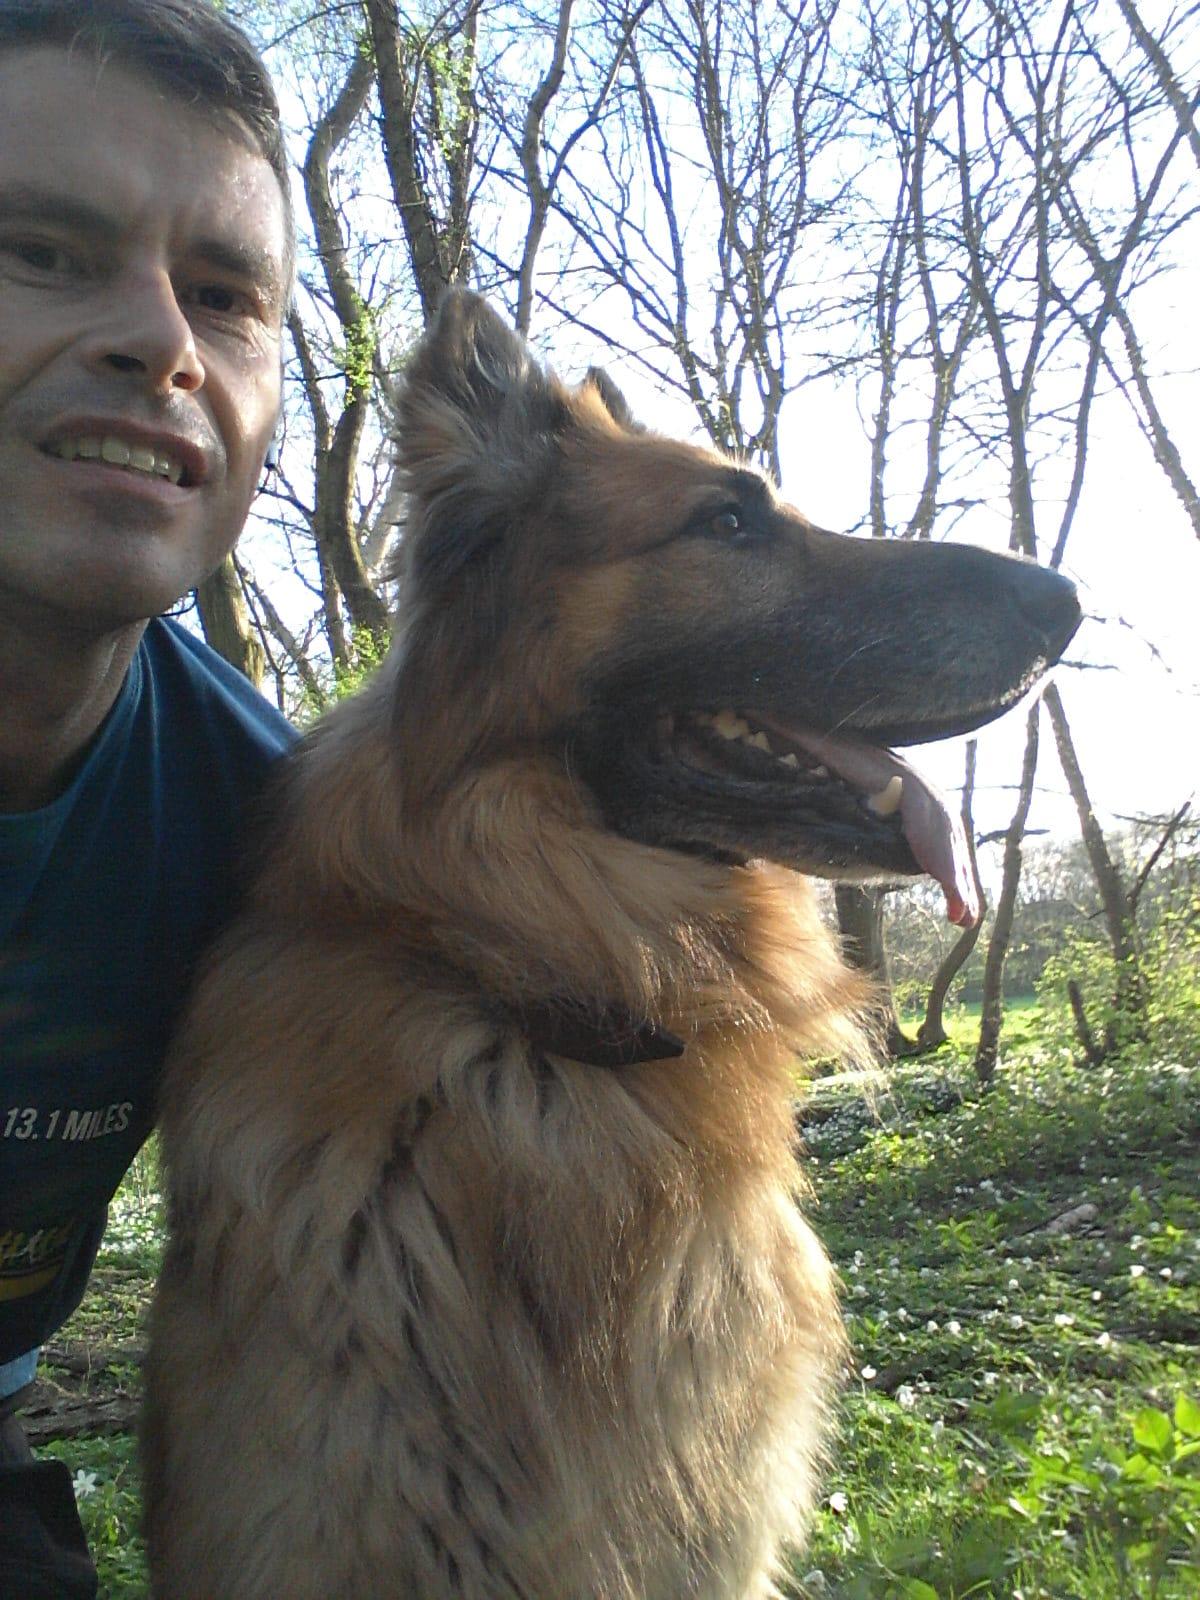 German Shepherd dog with his owner